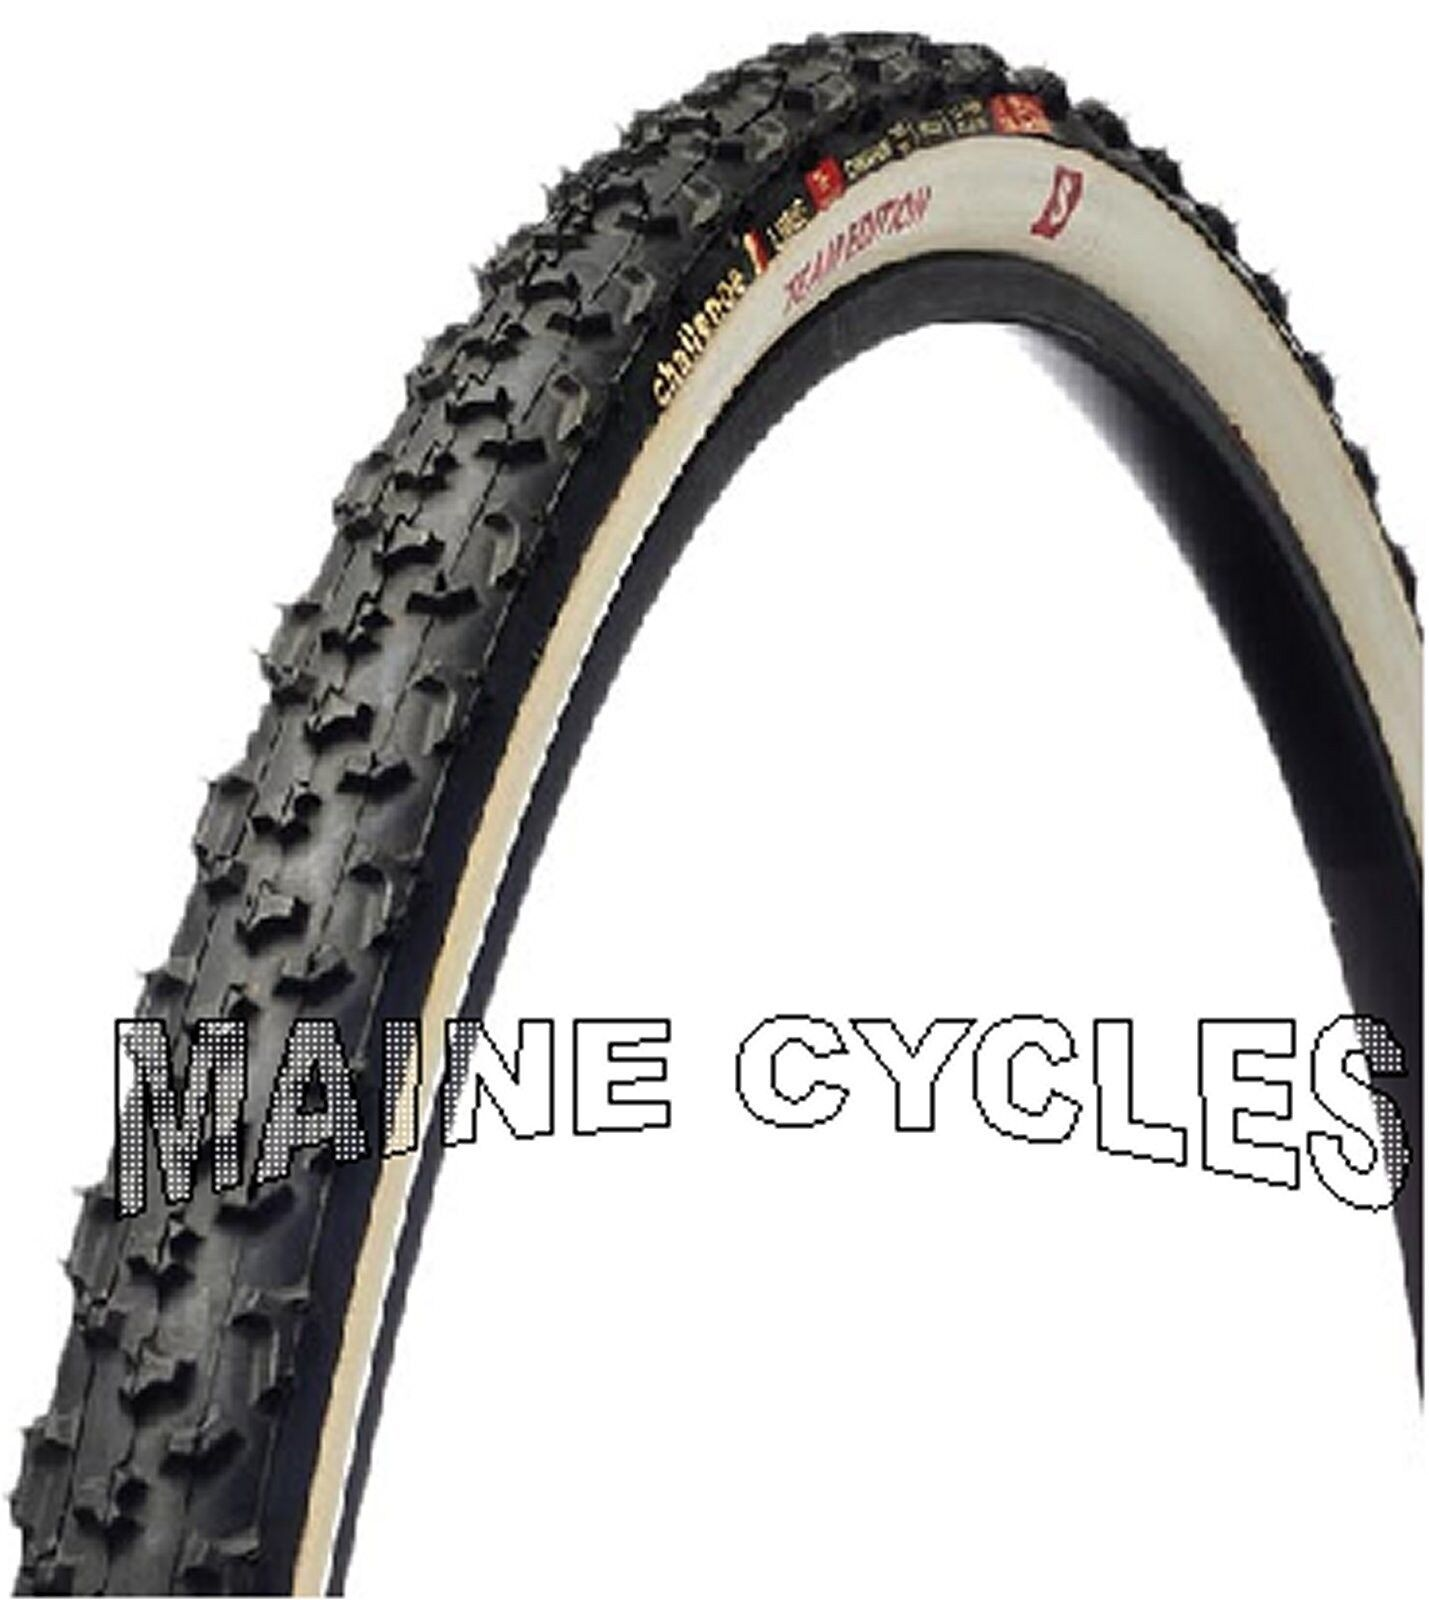 Challenge Limus S Team  Edition cyclocross tubular 700 x 33  top brand